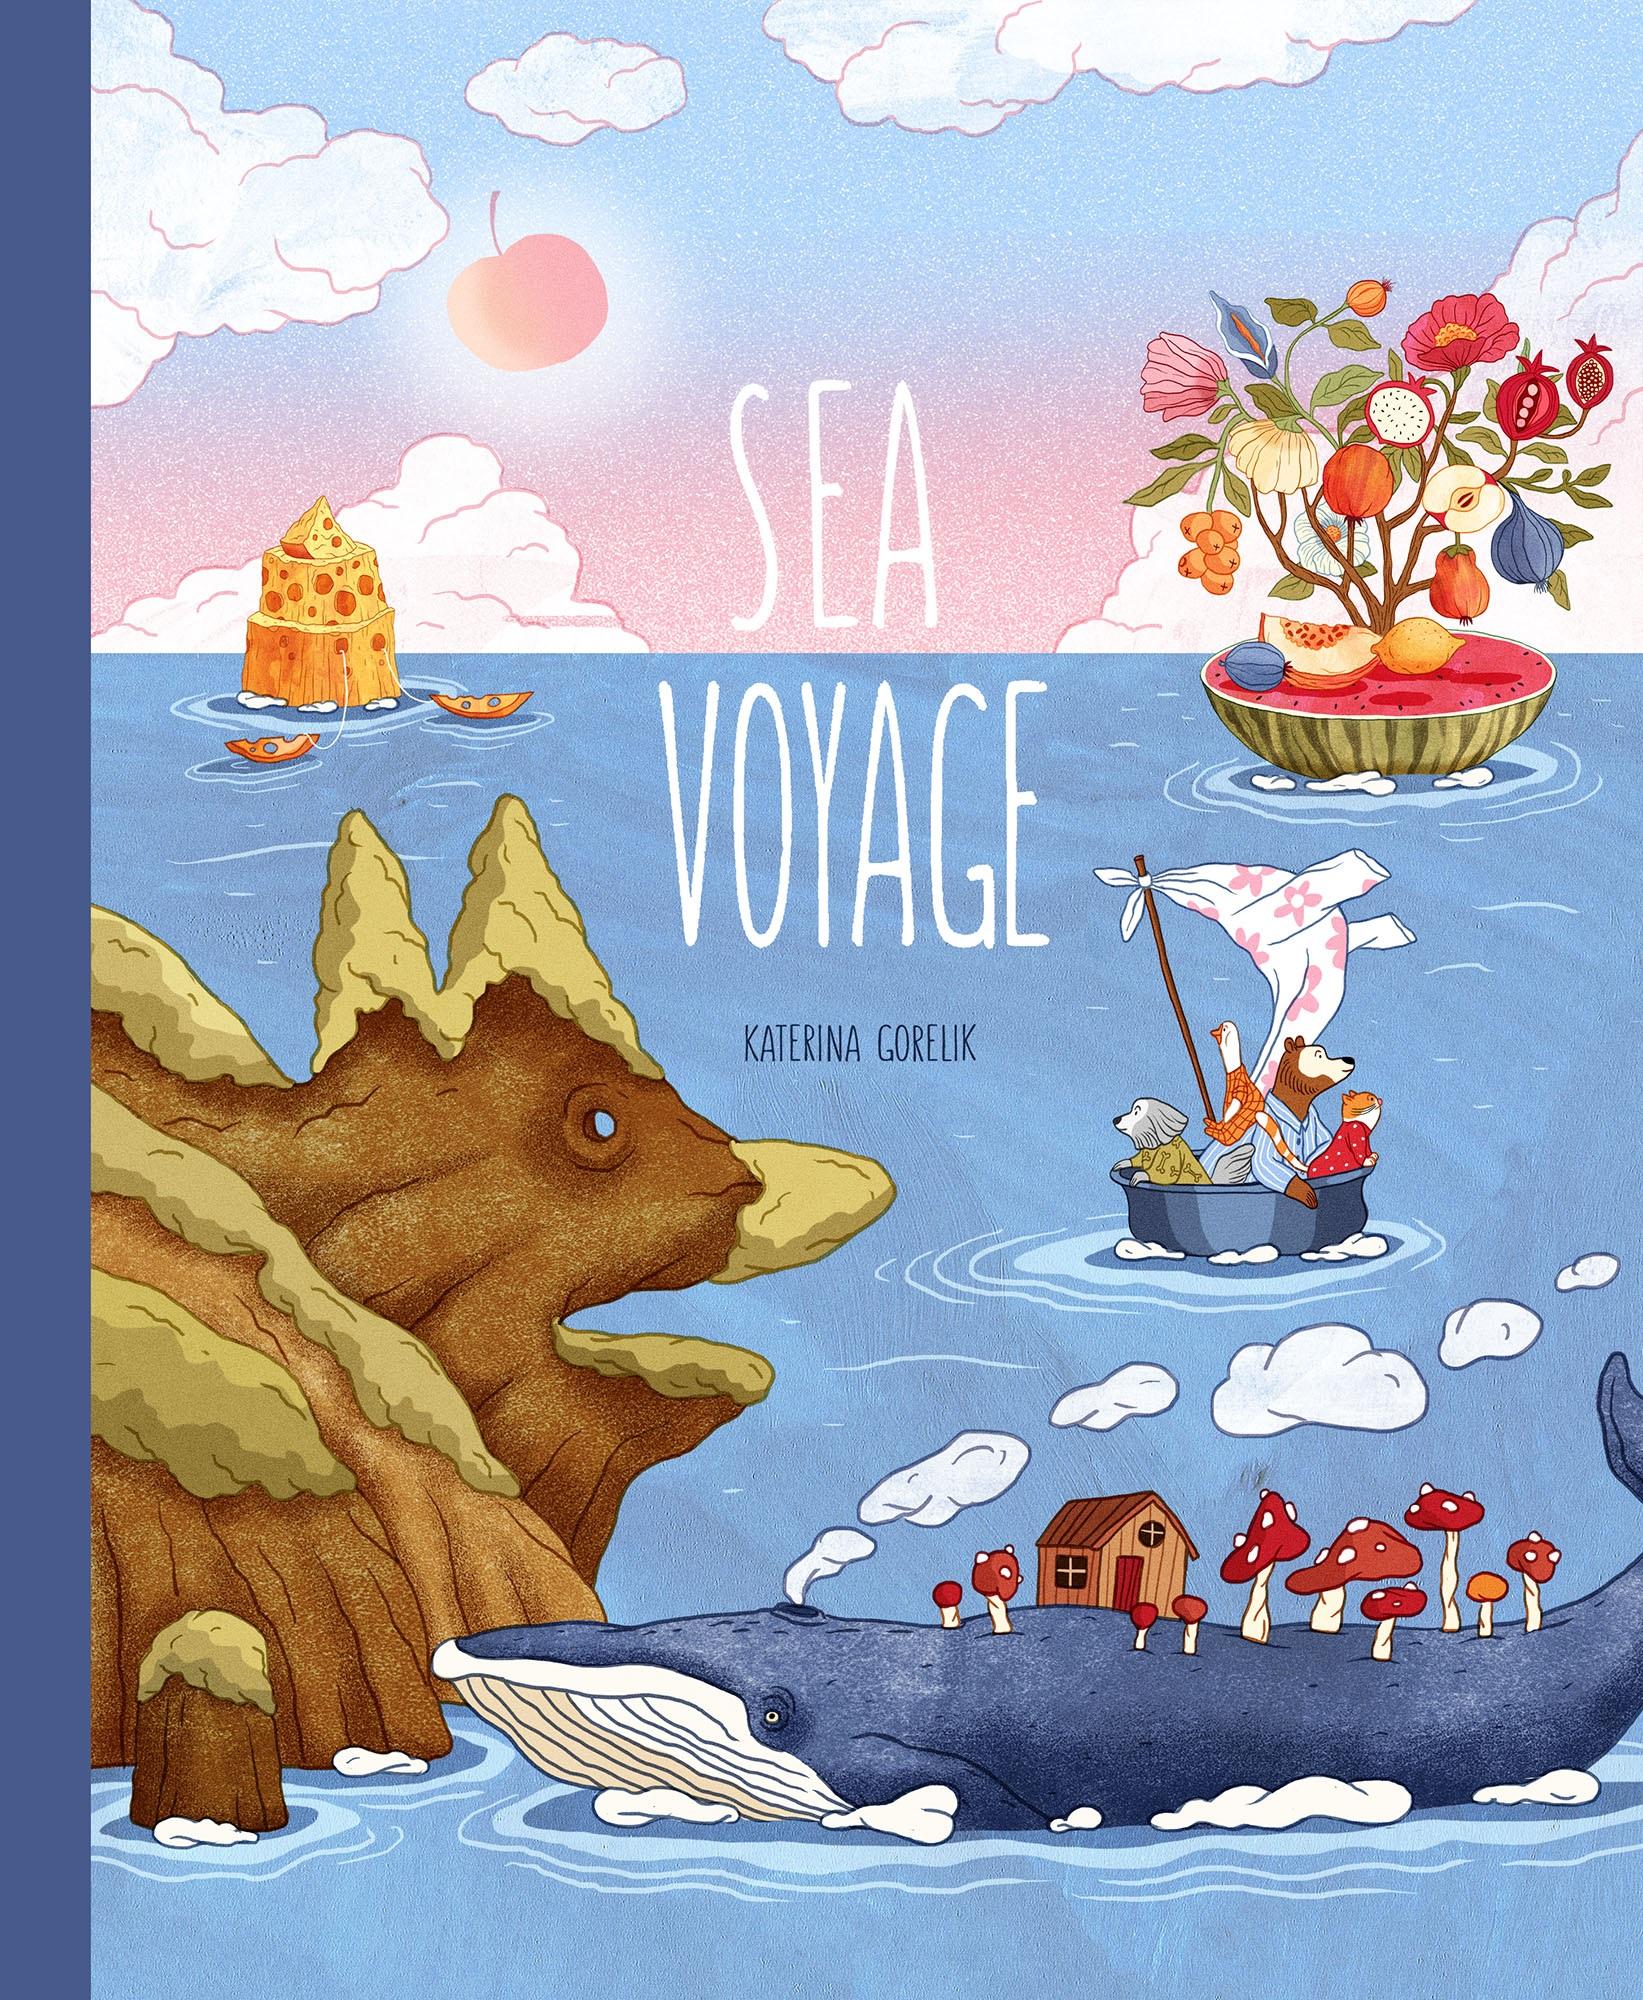 katerina sea voyage cover final